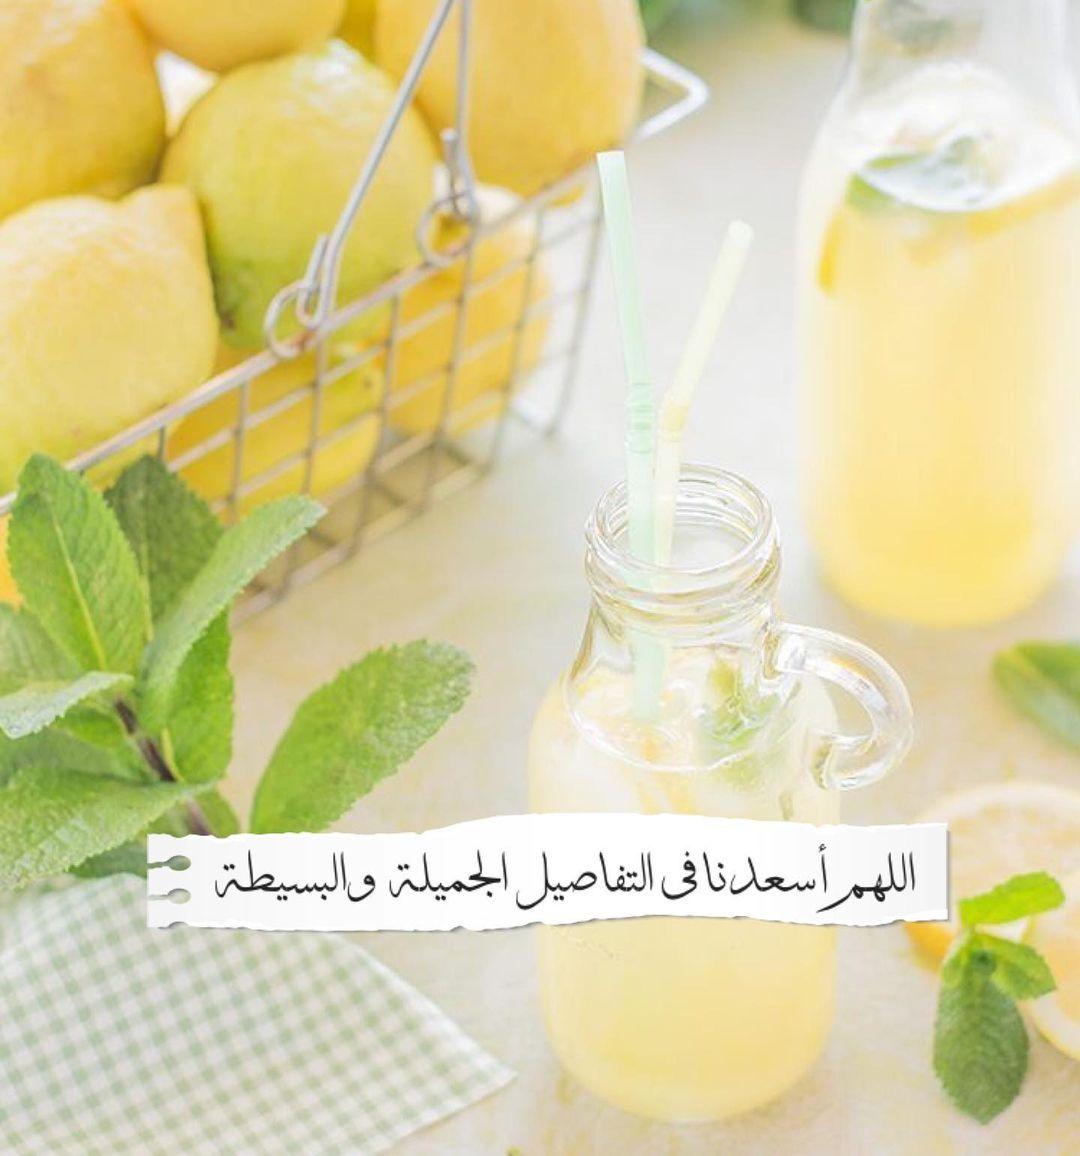 Aljanah On Instagram أذكار إسلامية ديني دين اسلام اسلامي هاشتاق اذكار صور رمزيات خلفيات تذكير دنيا الاخرة استغ Fruit Qoutes Fun Stickers